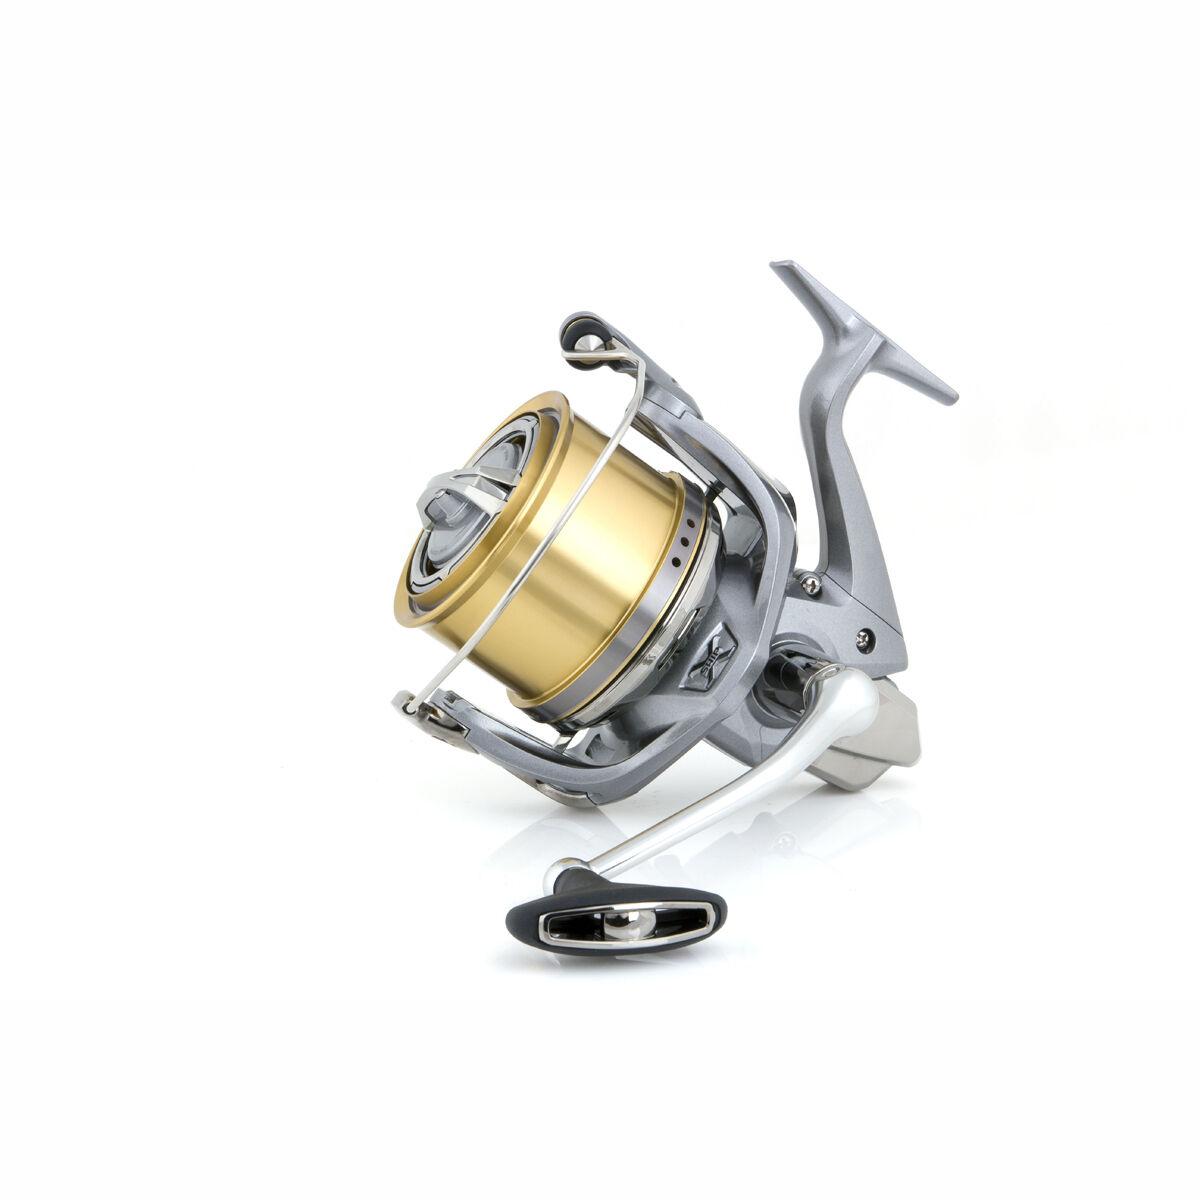 Shimano Shimano Shimano Ultegra 3500 XSD Competition Fishing Spod Reel - UL35XSDCOMP dbf87e